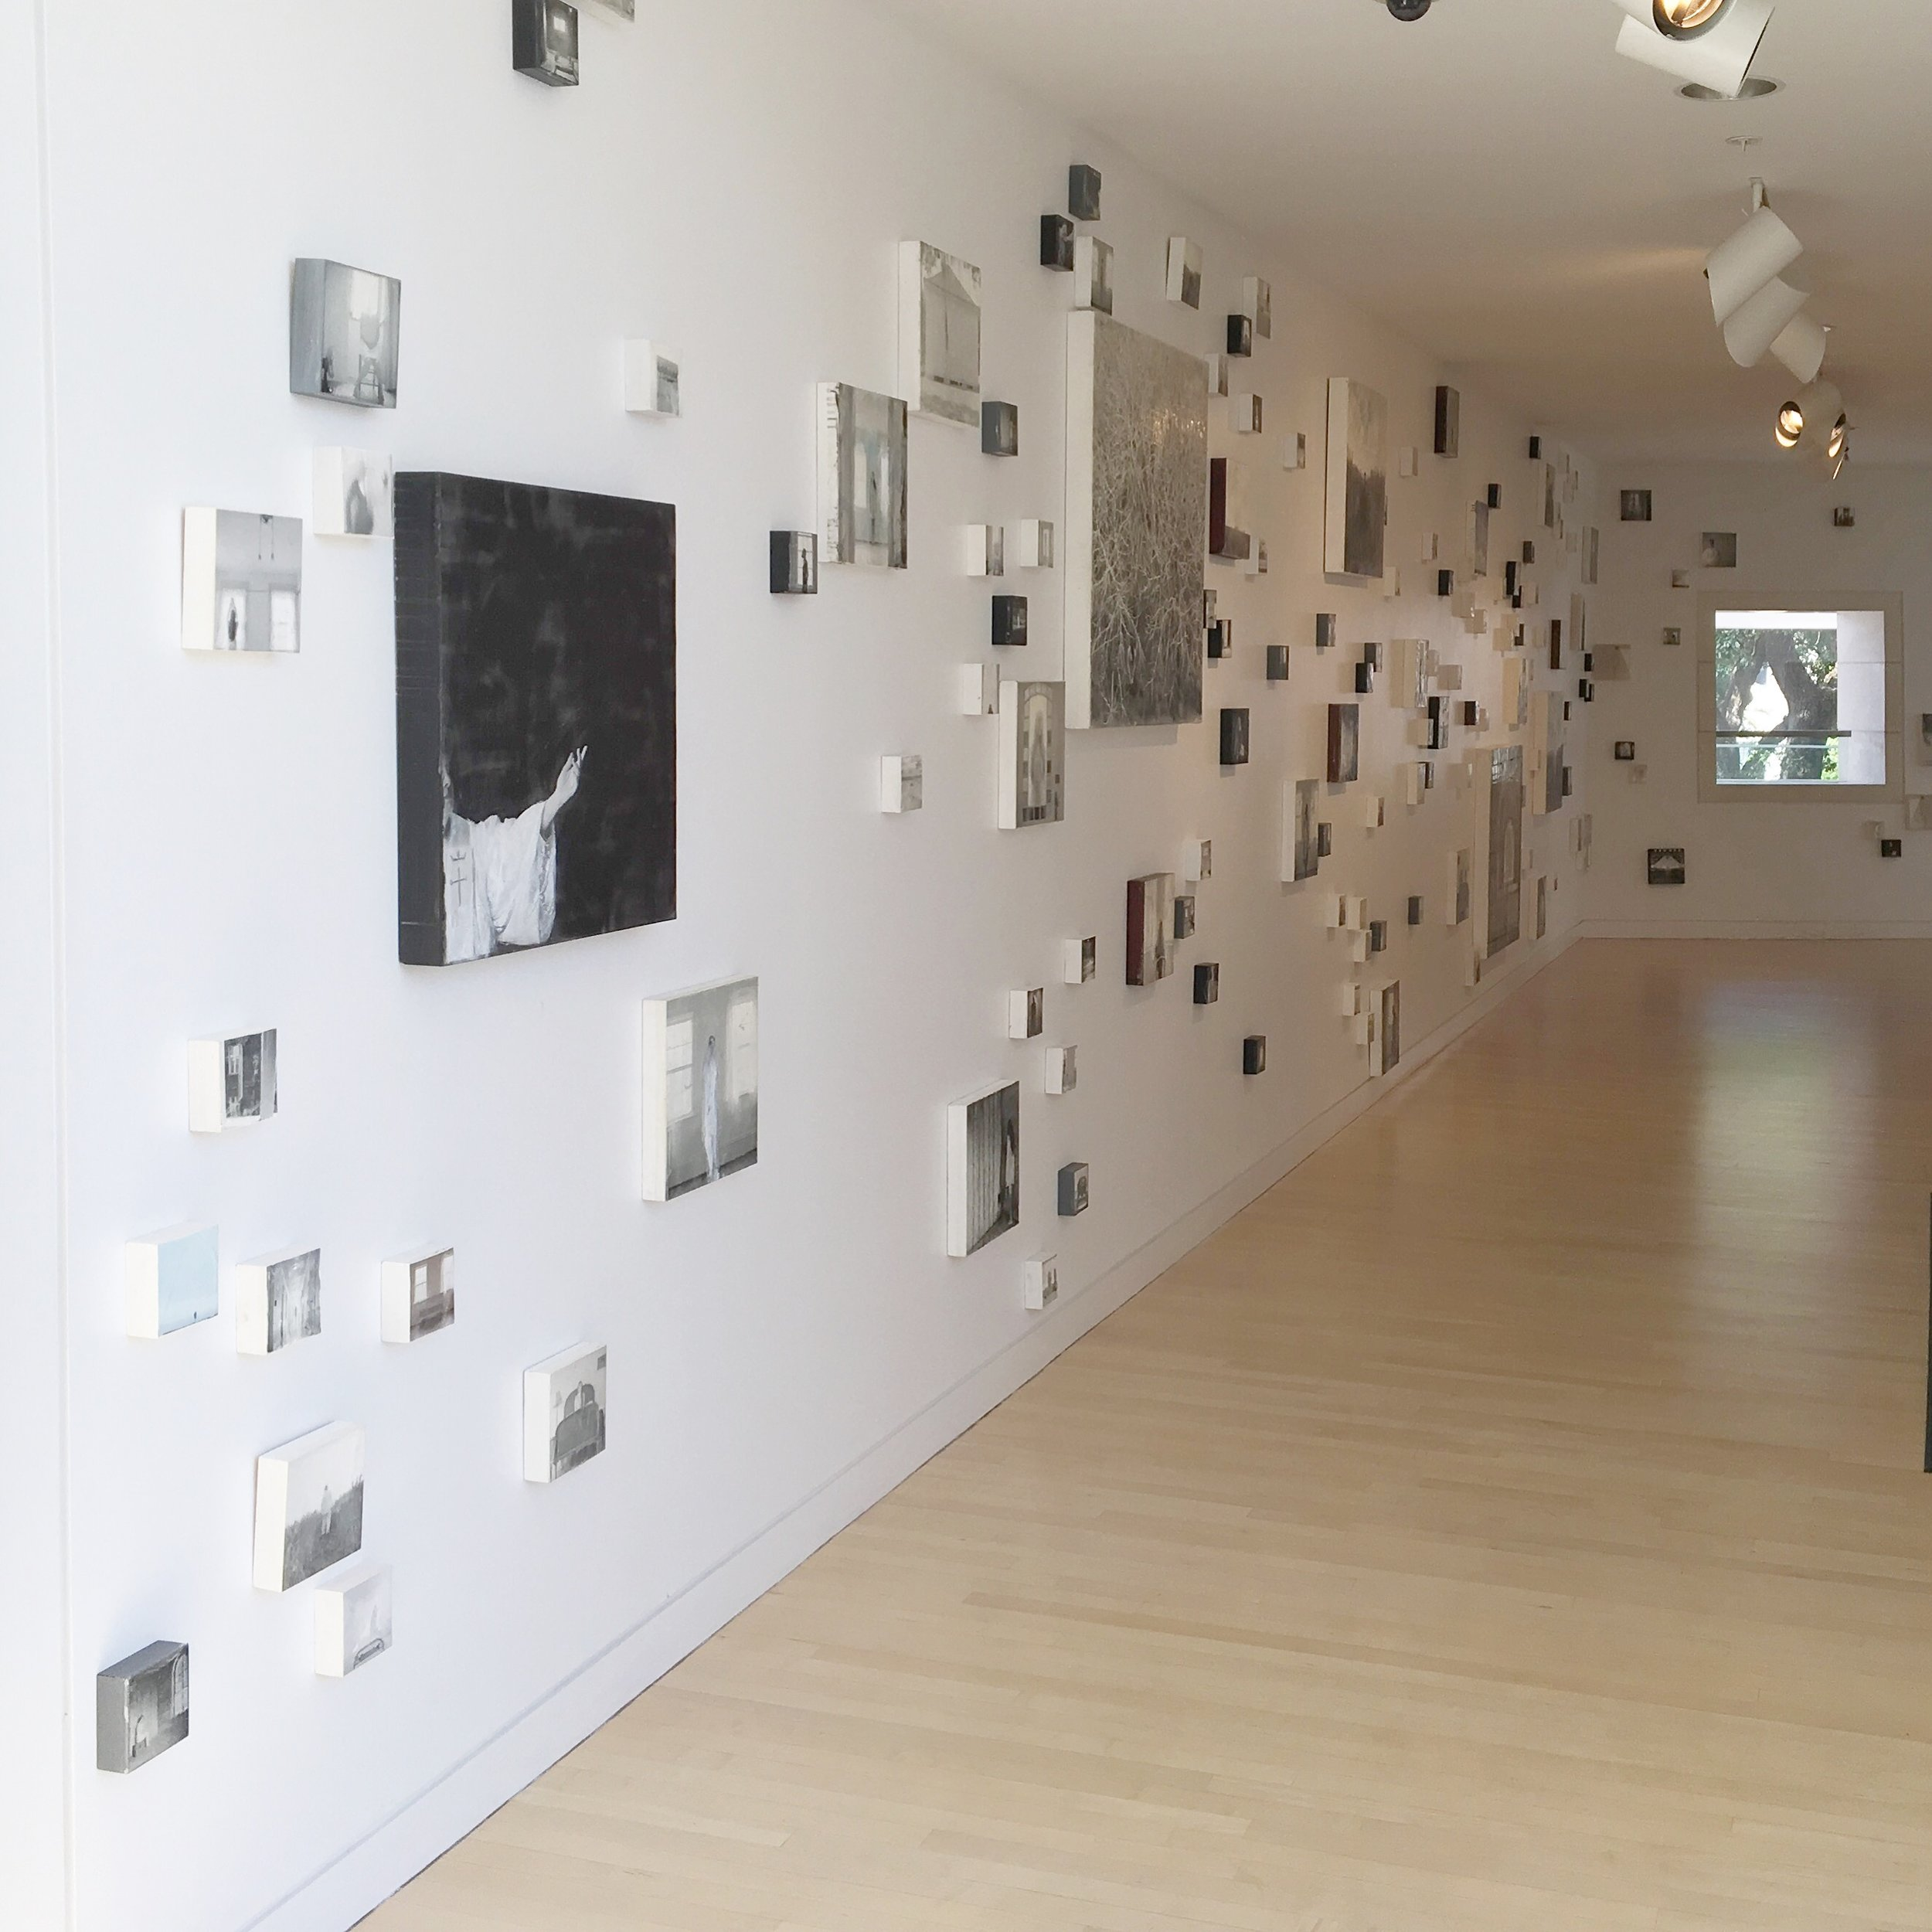 nakazora - jepson center for the arts